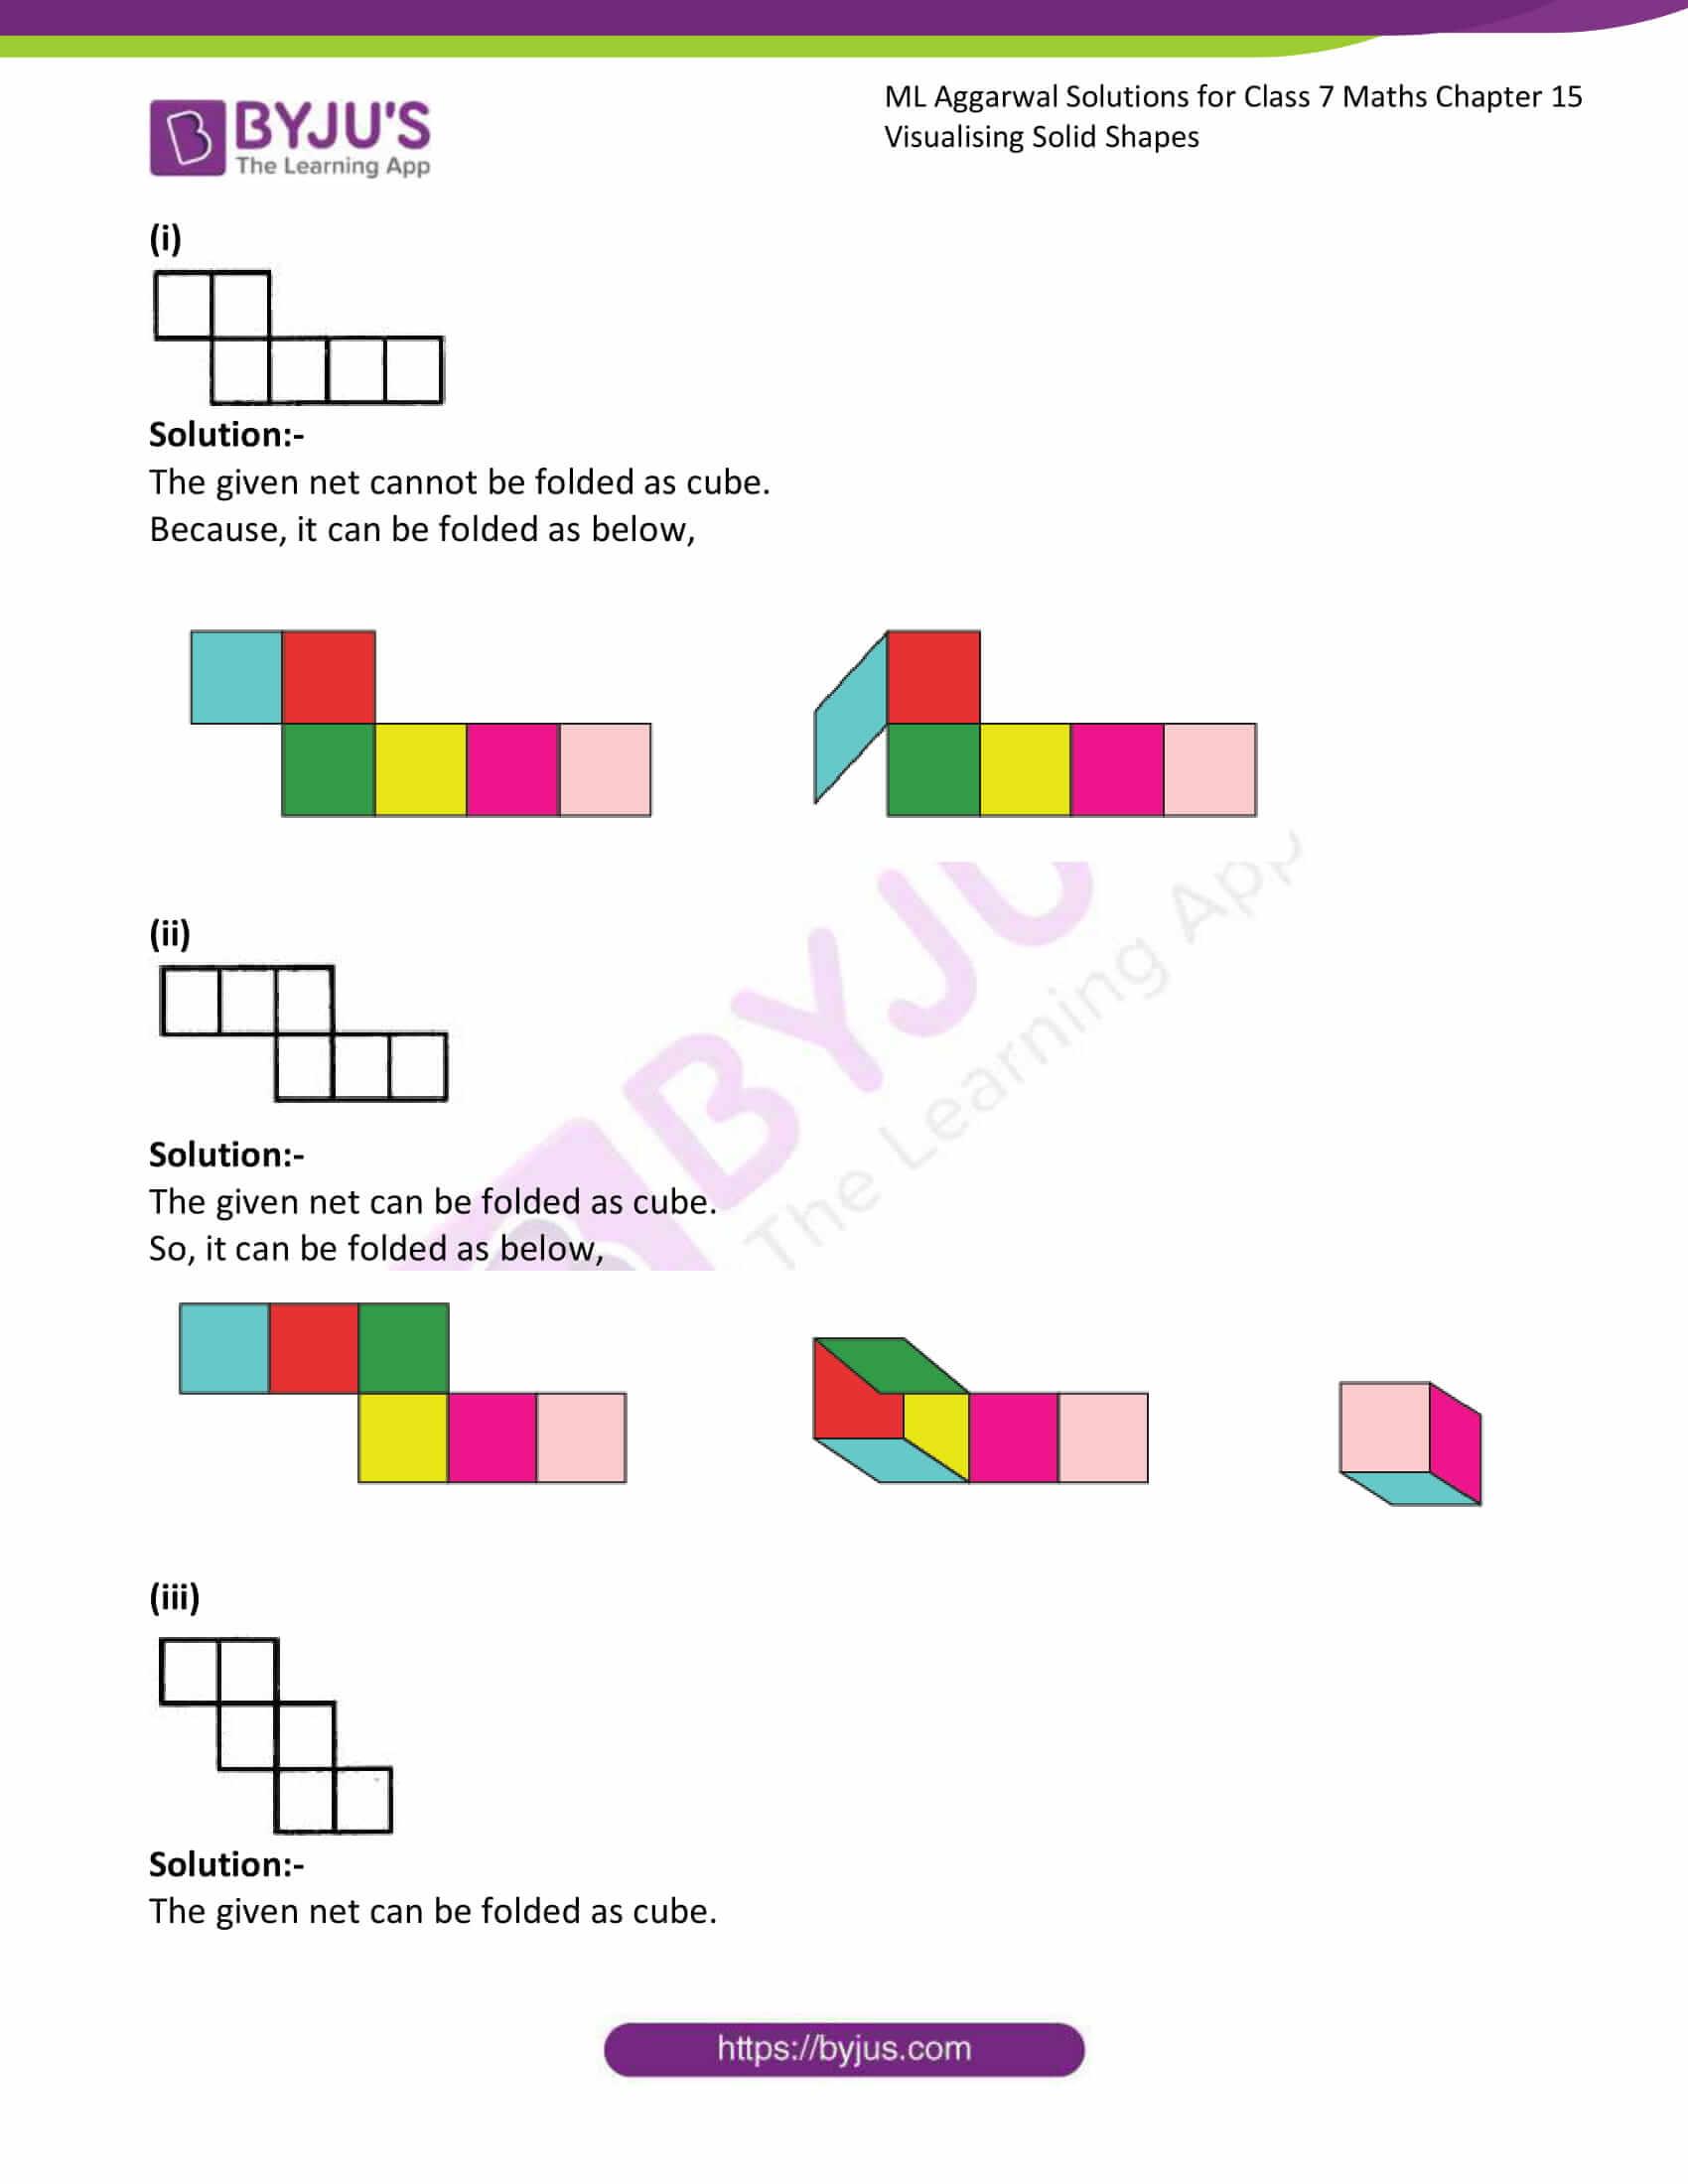 ml aggarwal sol class 7 maths chapter 15 3